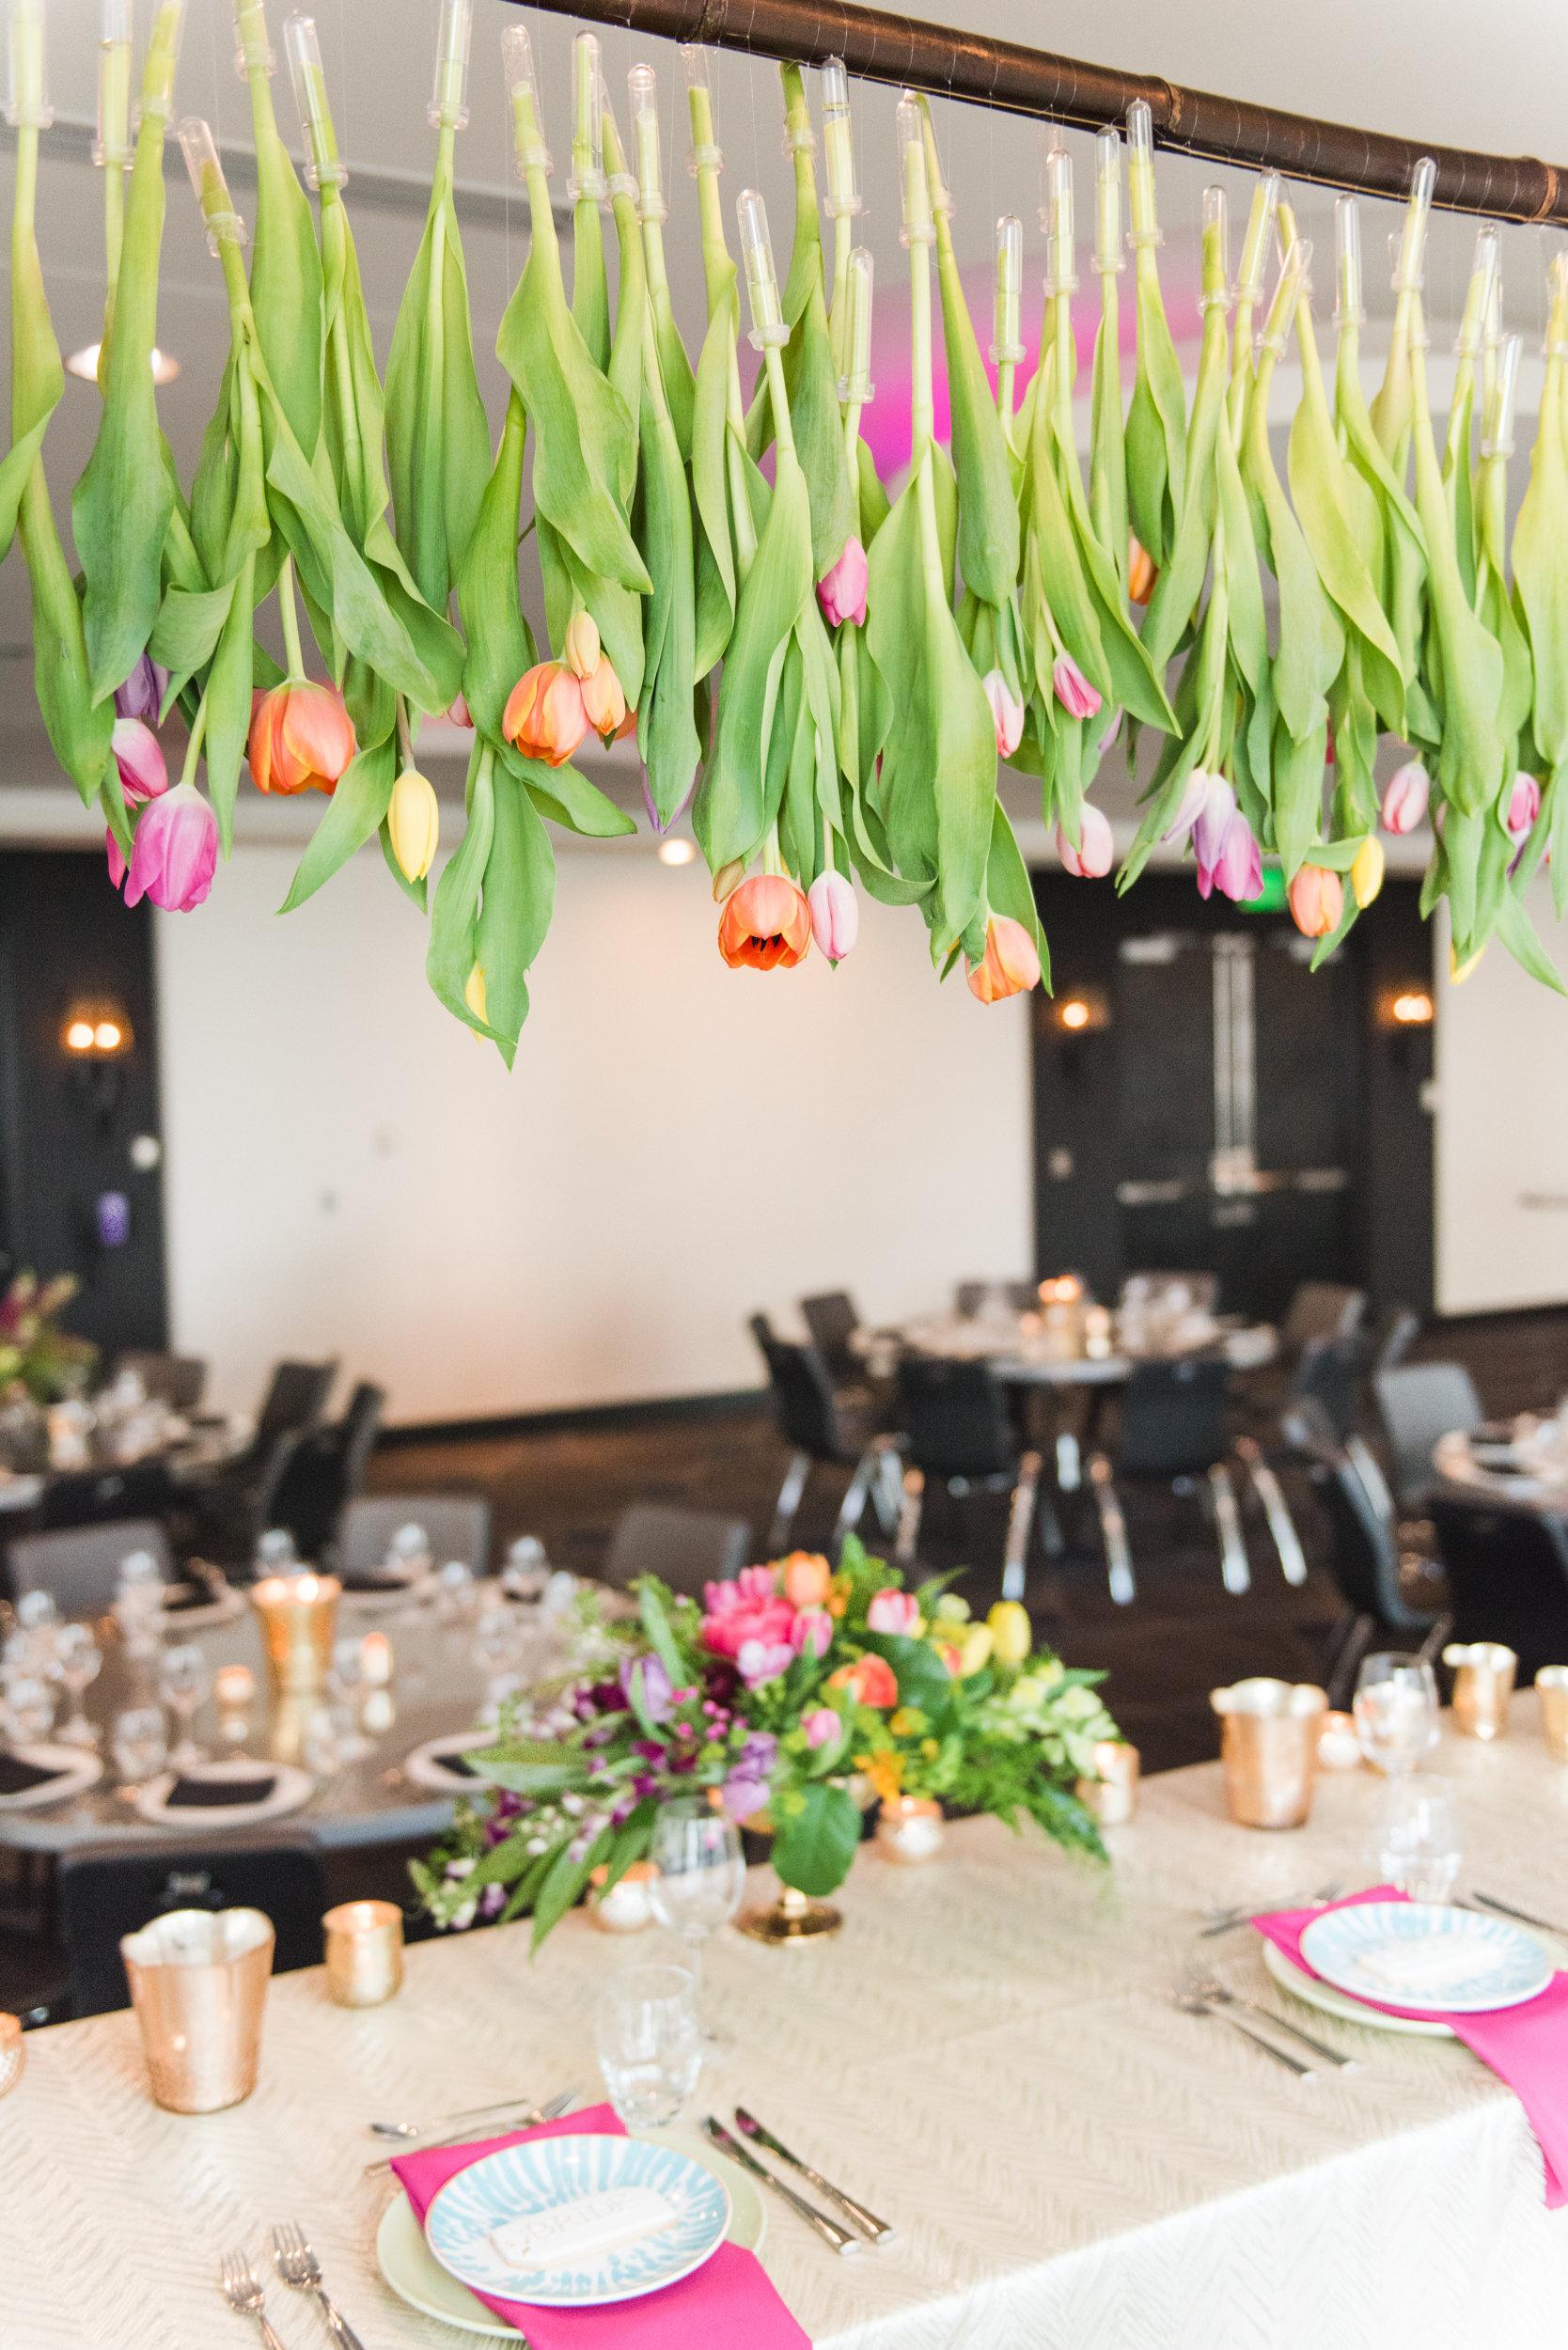 Hanging tulips, hanging flower installation  Jessica Wonders Events, Minneapolis, MN